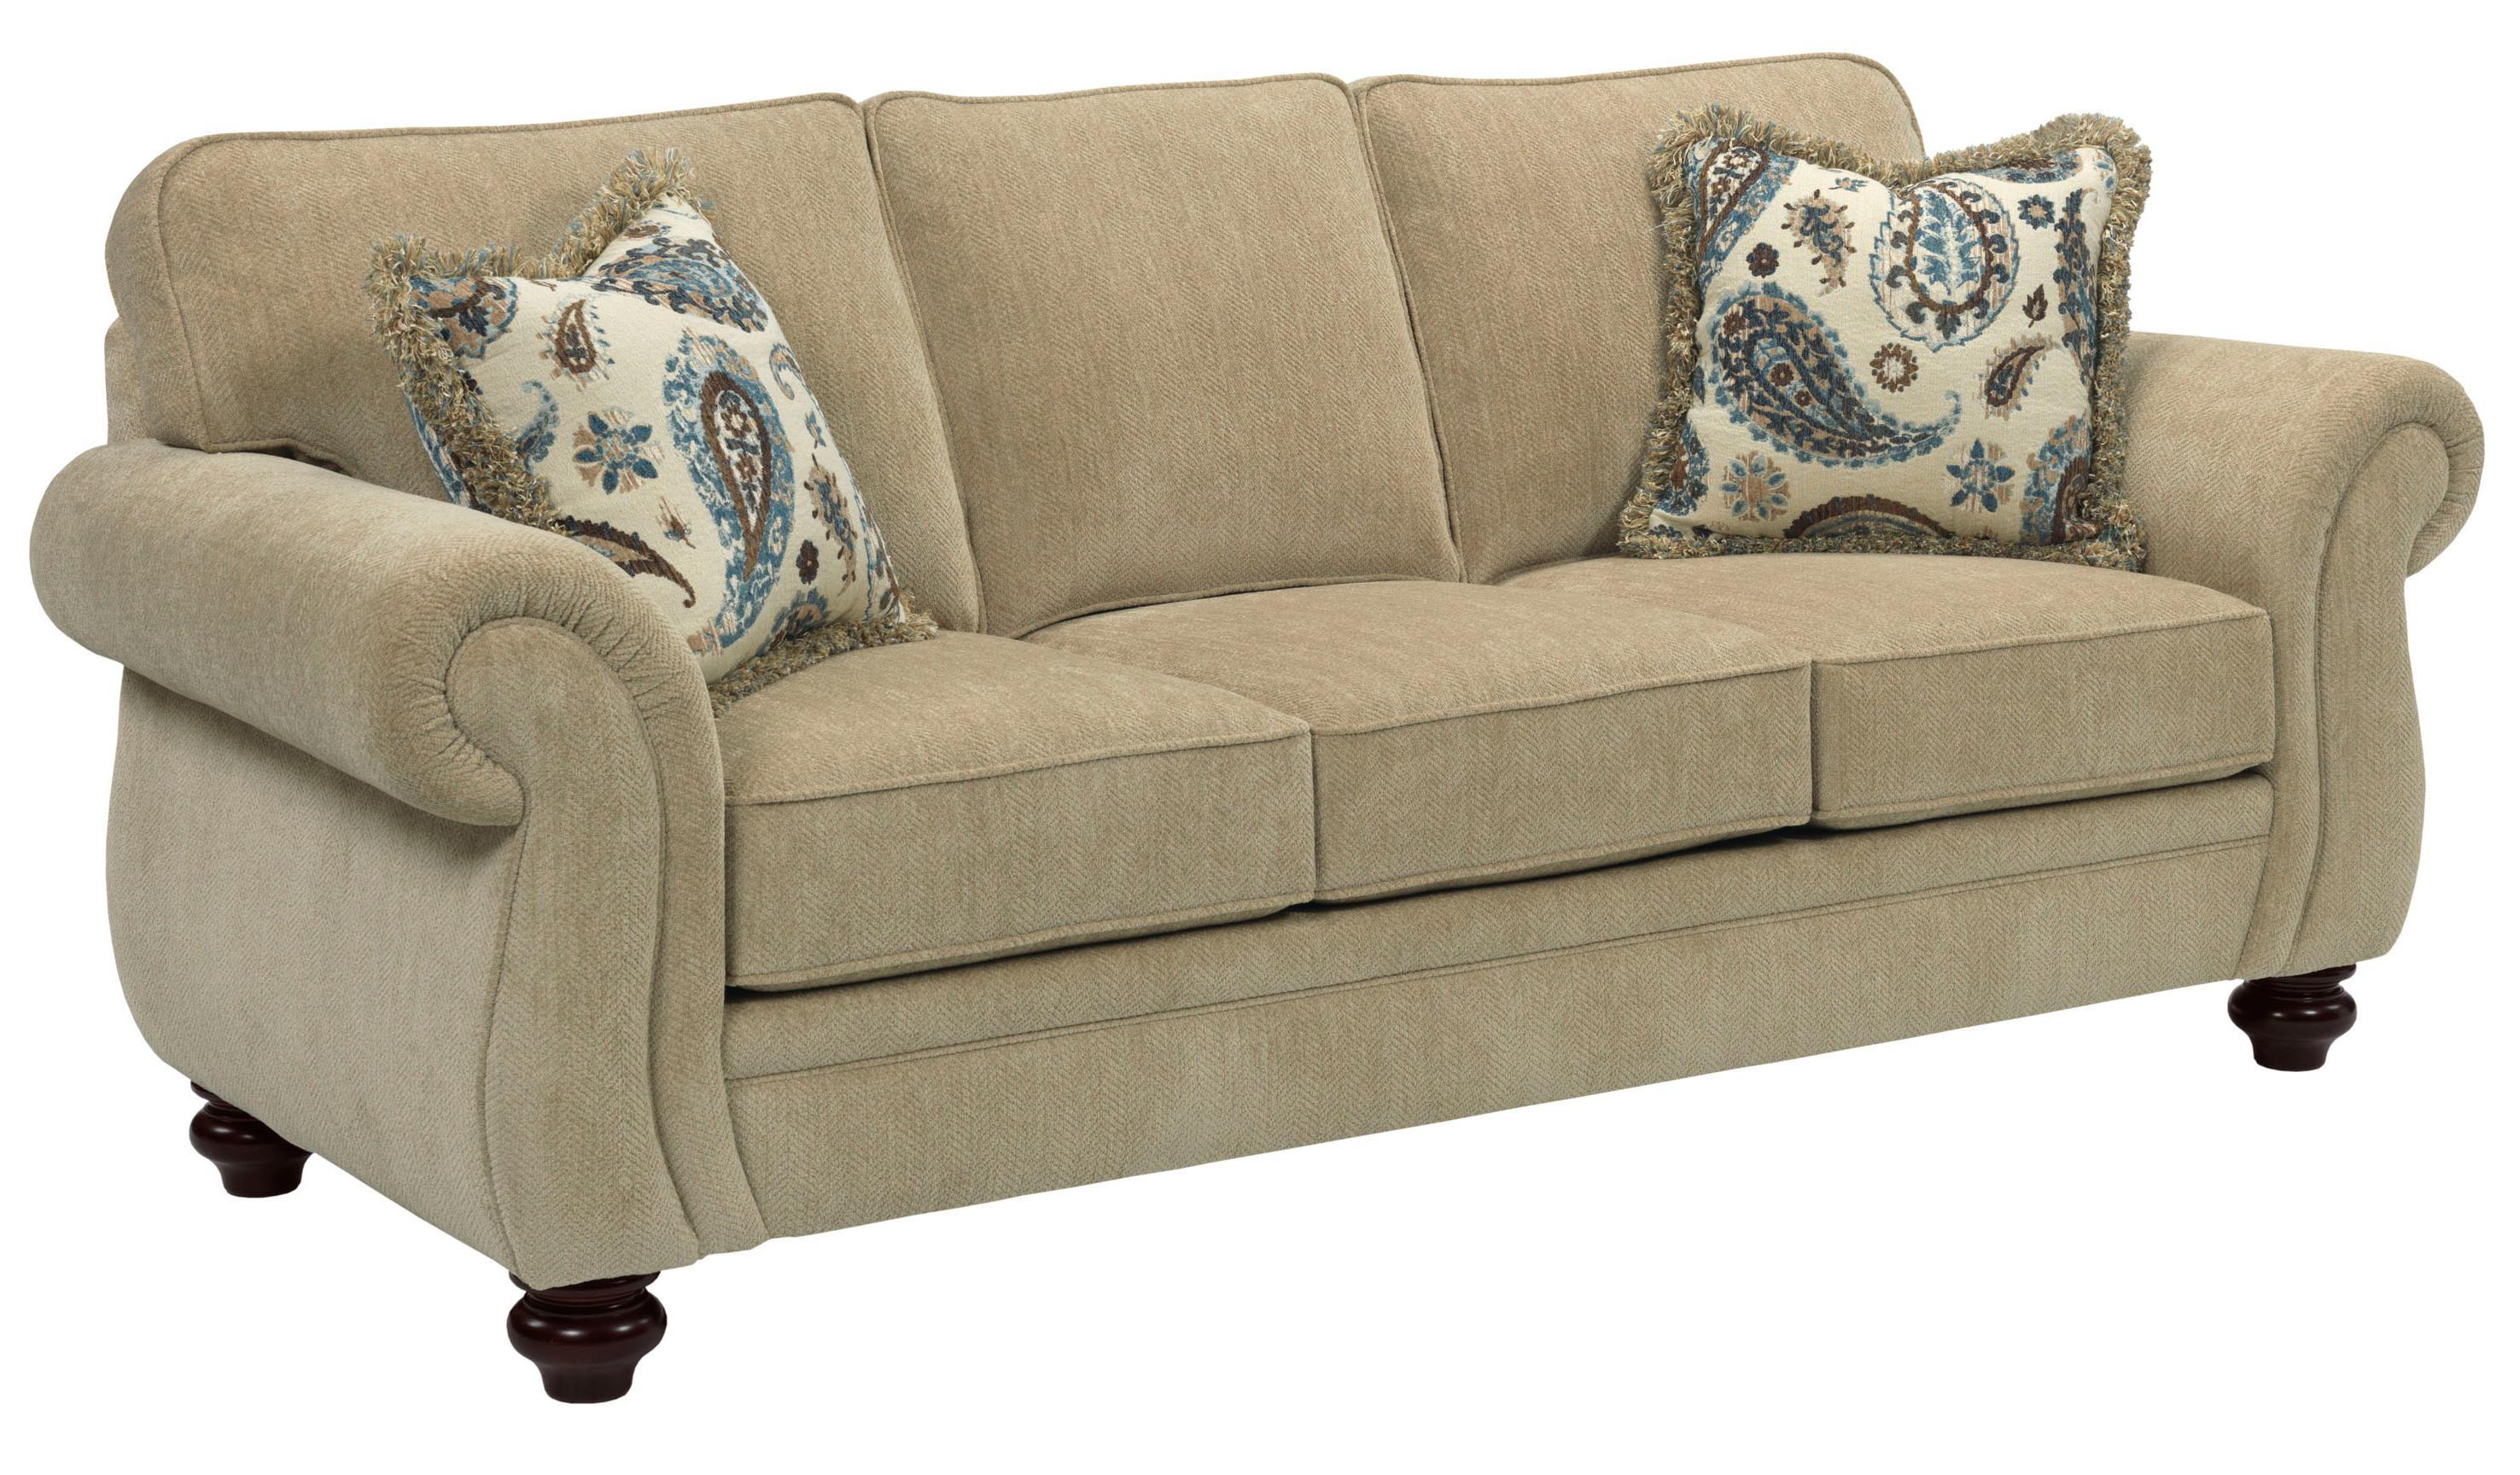 Traditional sleeper sofa awesome traditional sleeper sofa for Traditional sofas